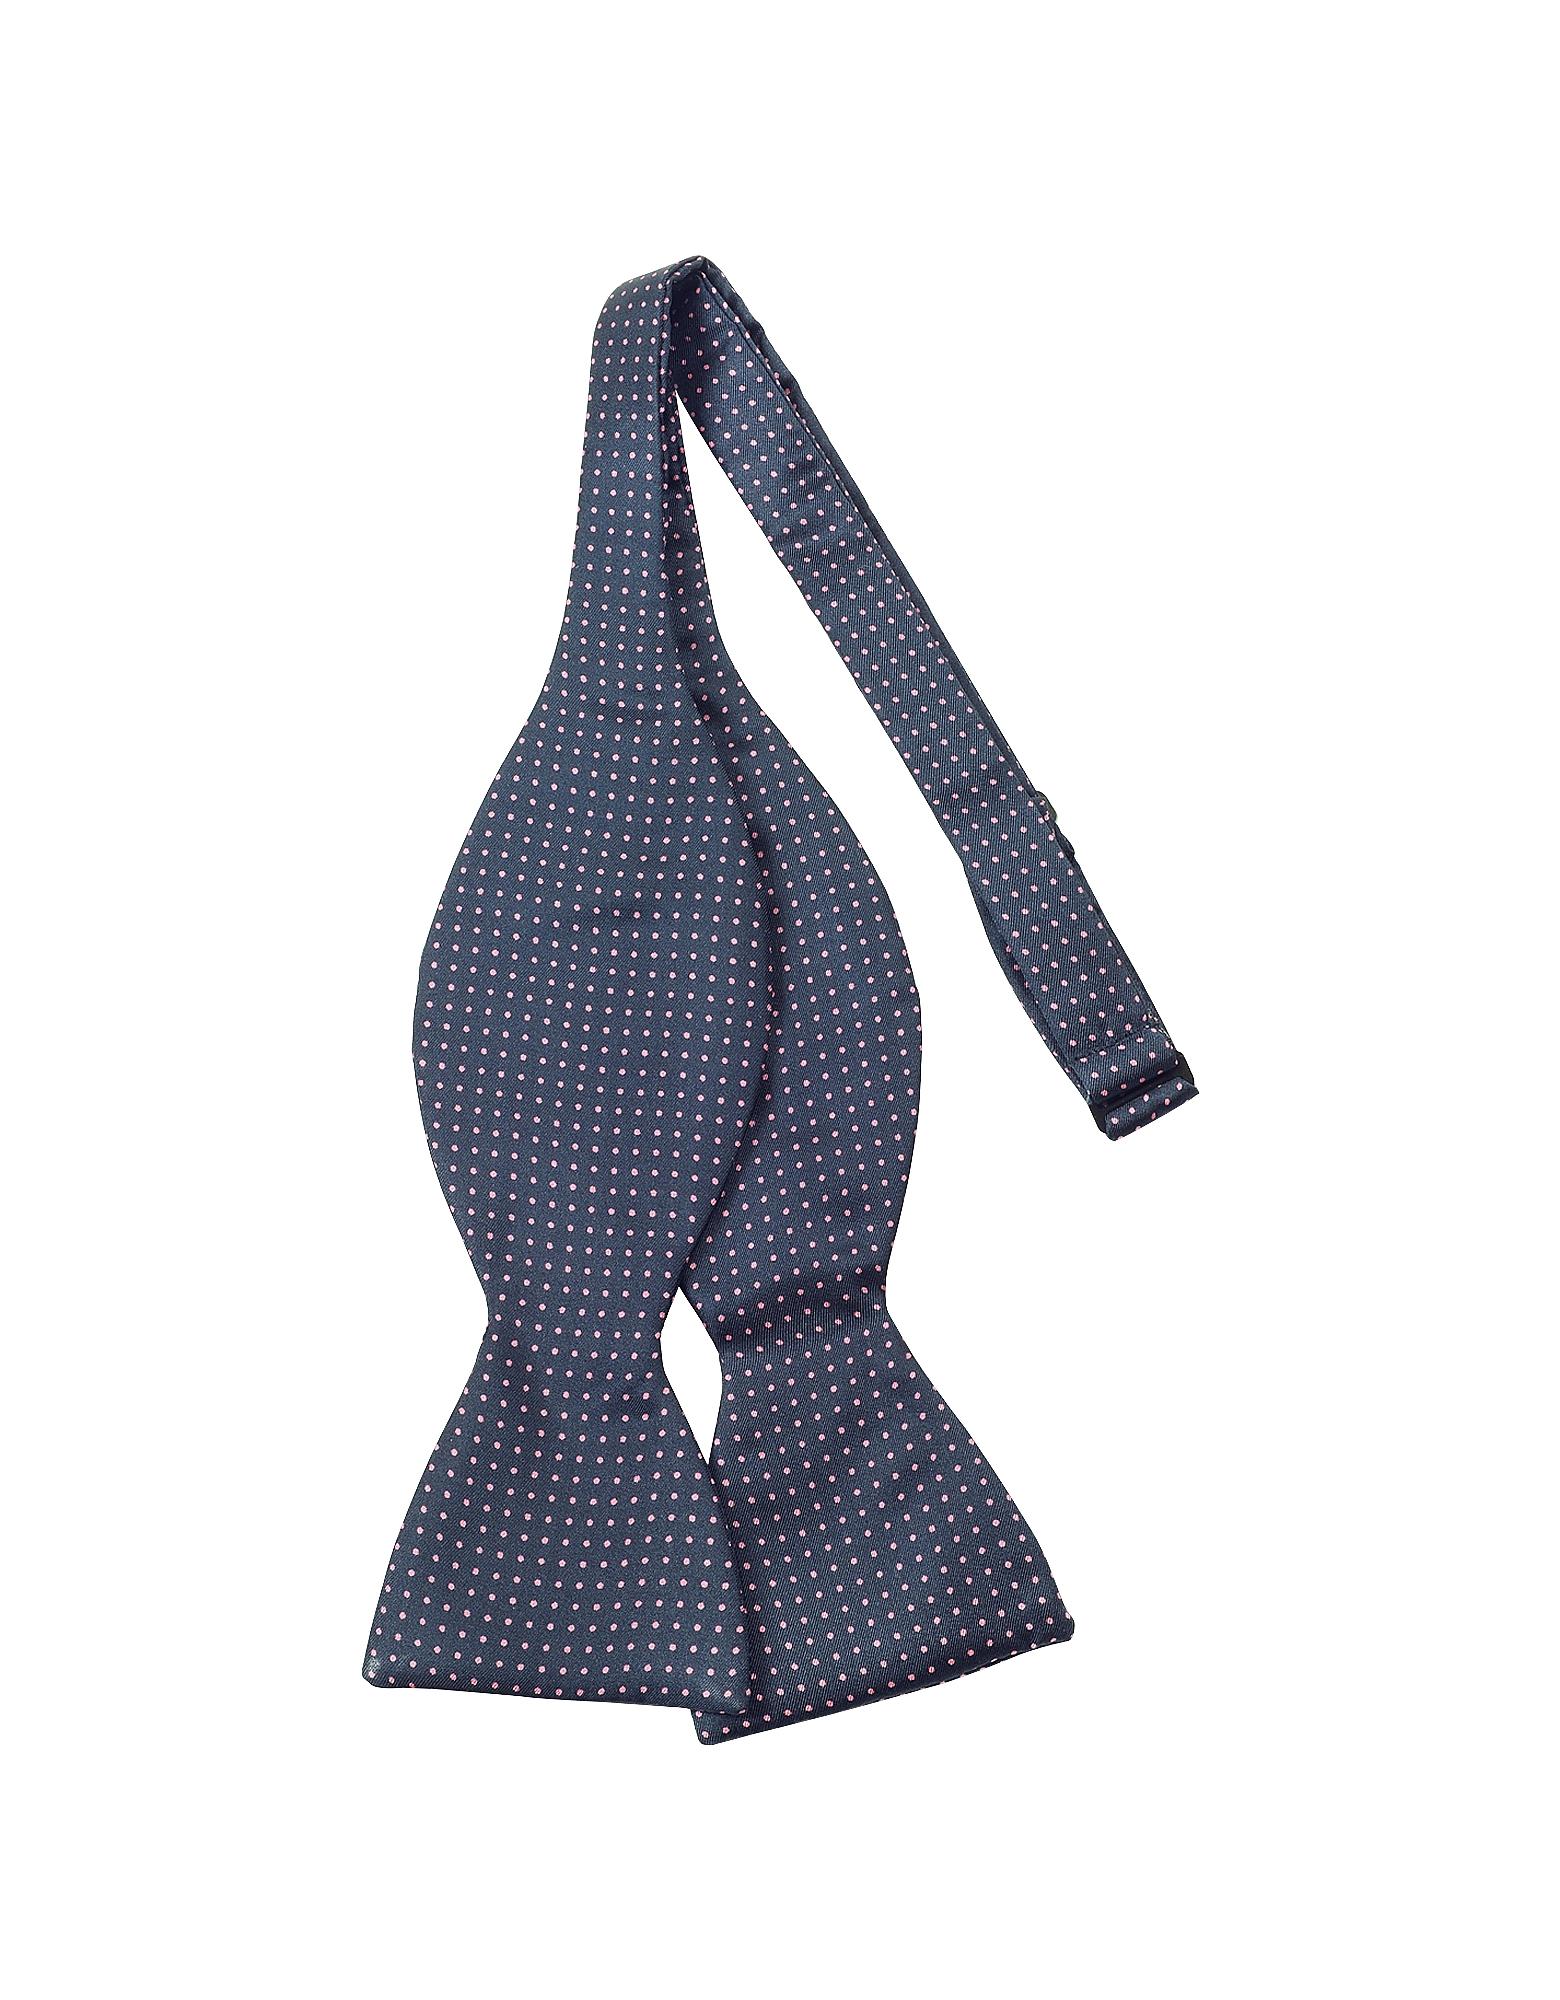 Forzieri Bowties and Cummerbunds, Small Polkadot Self-tie Silk Bowtie